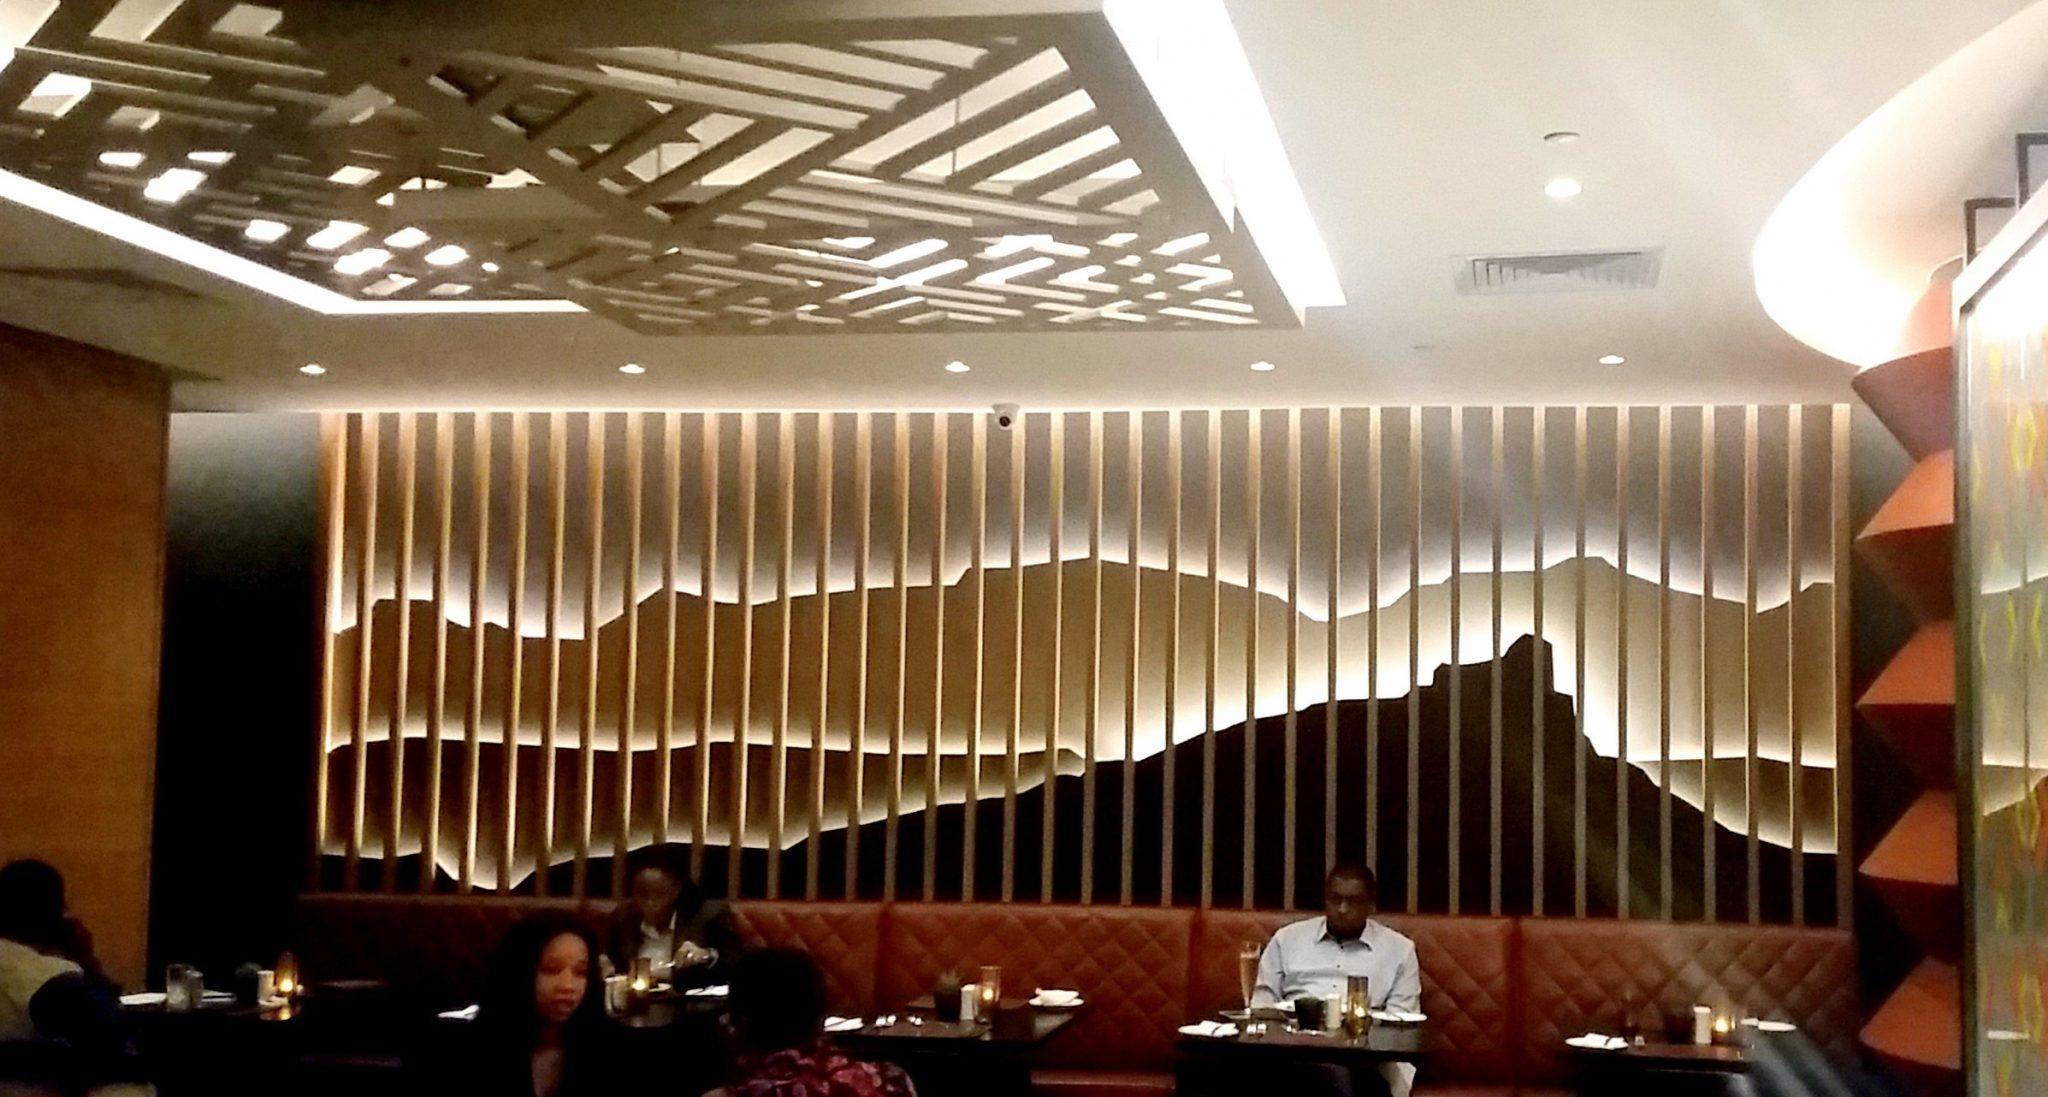 Vasco's Restaurant, Sugar & Spice